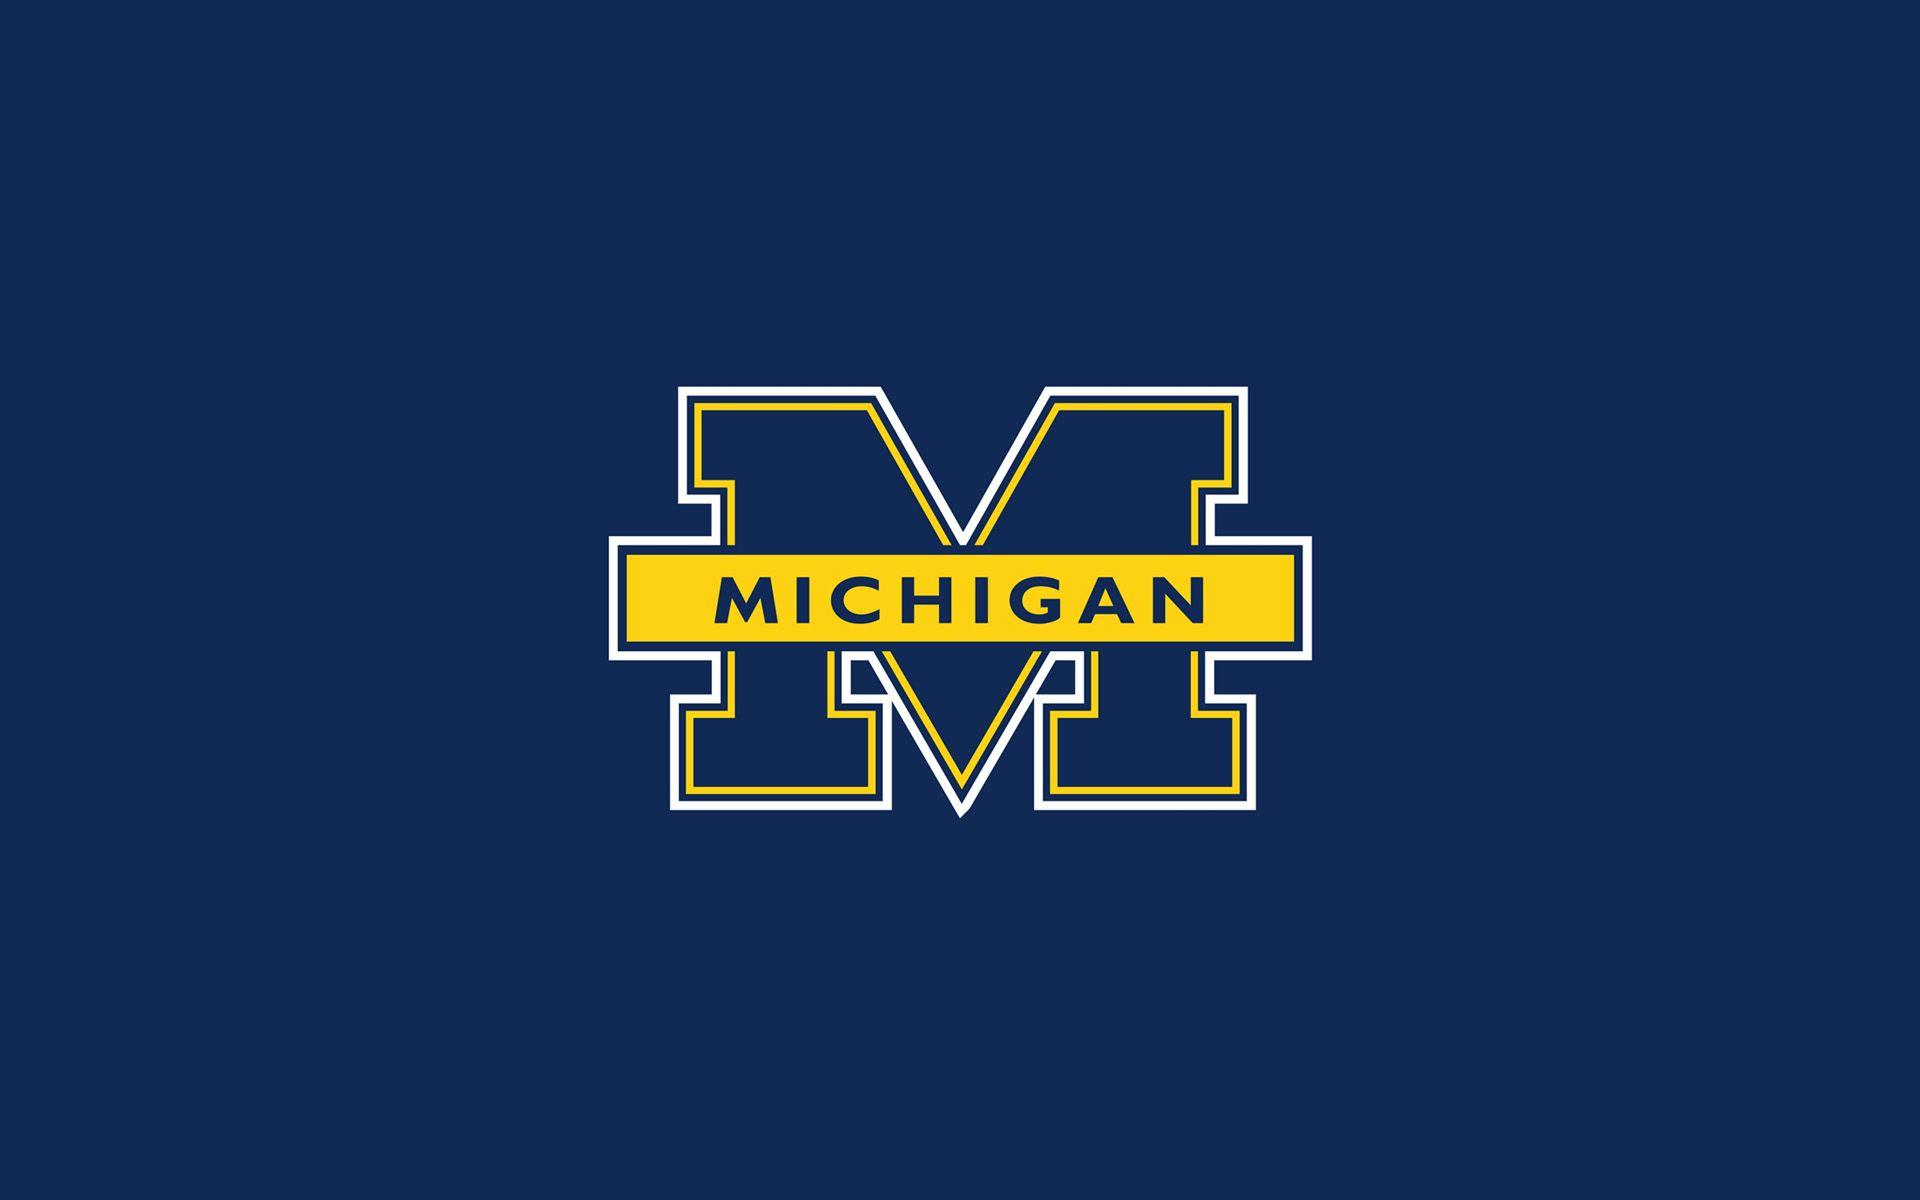 Michigan Wolverines Wallpaper 1 Michigan Wolverines Michigan Wolverines